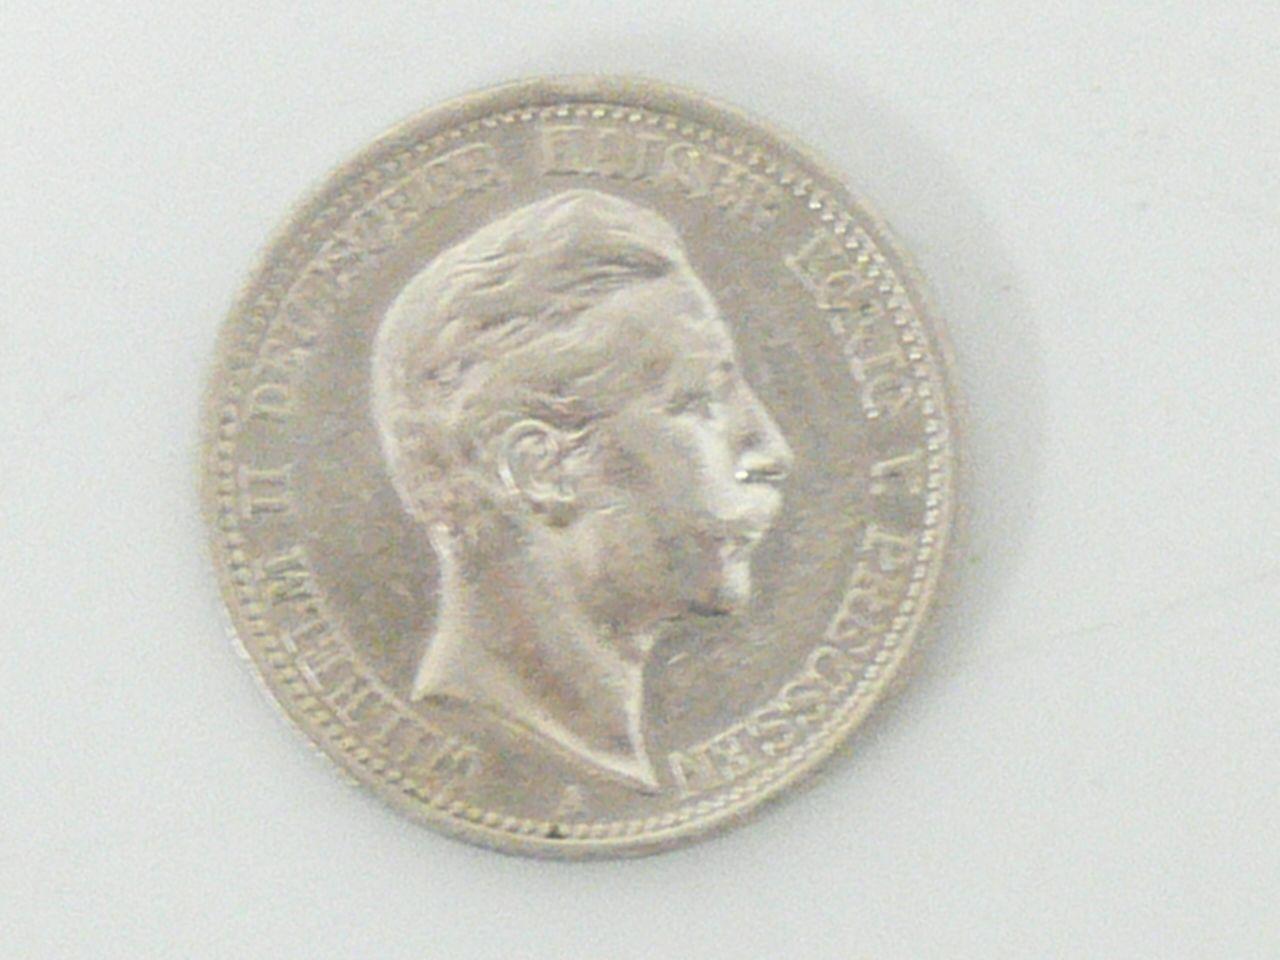 Silver Coin Germany Prussia 22 00 Coin Preussen Sammlerstucke